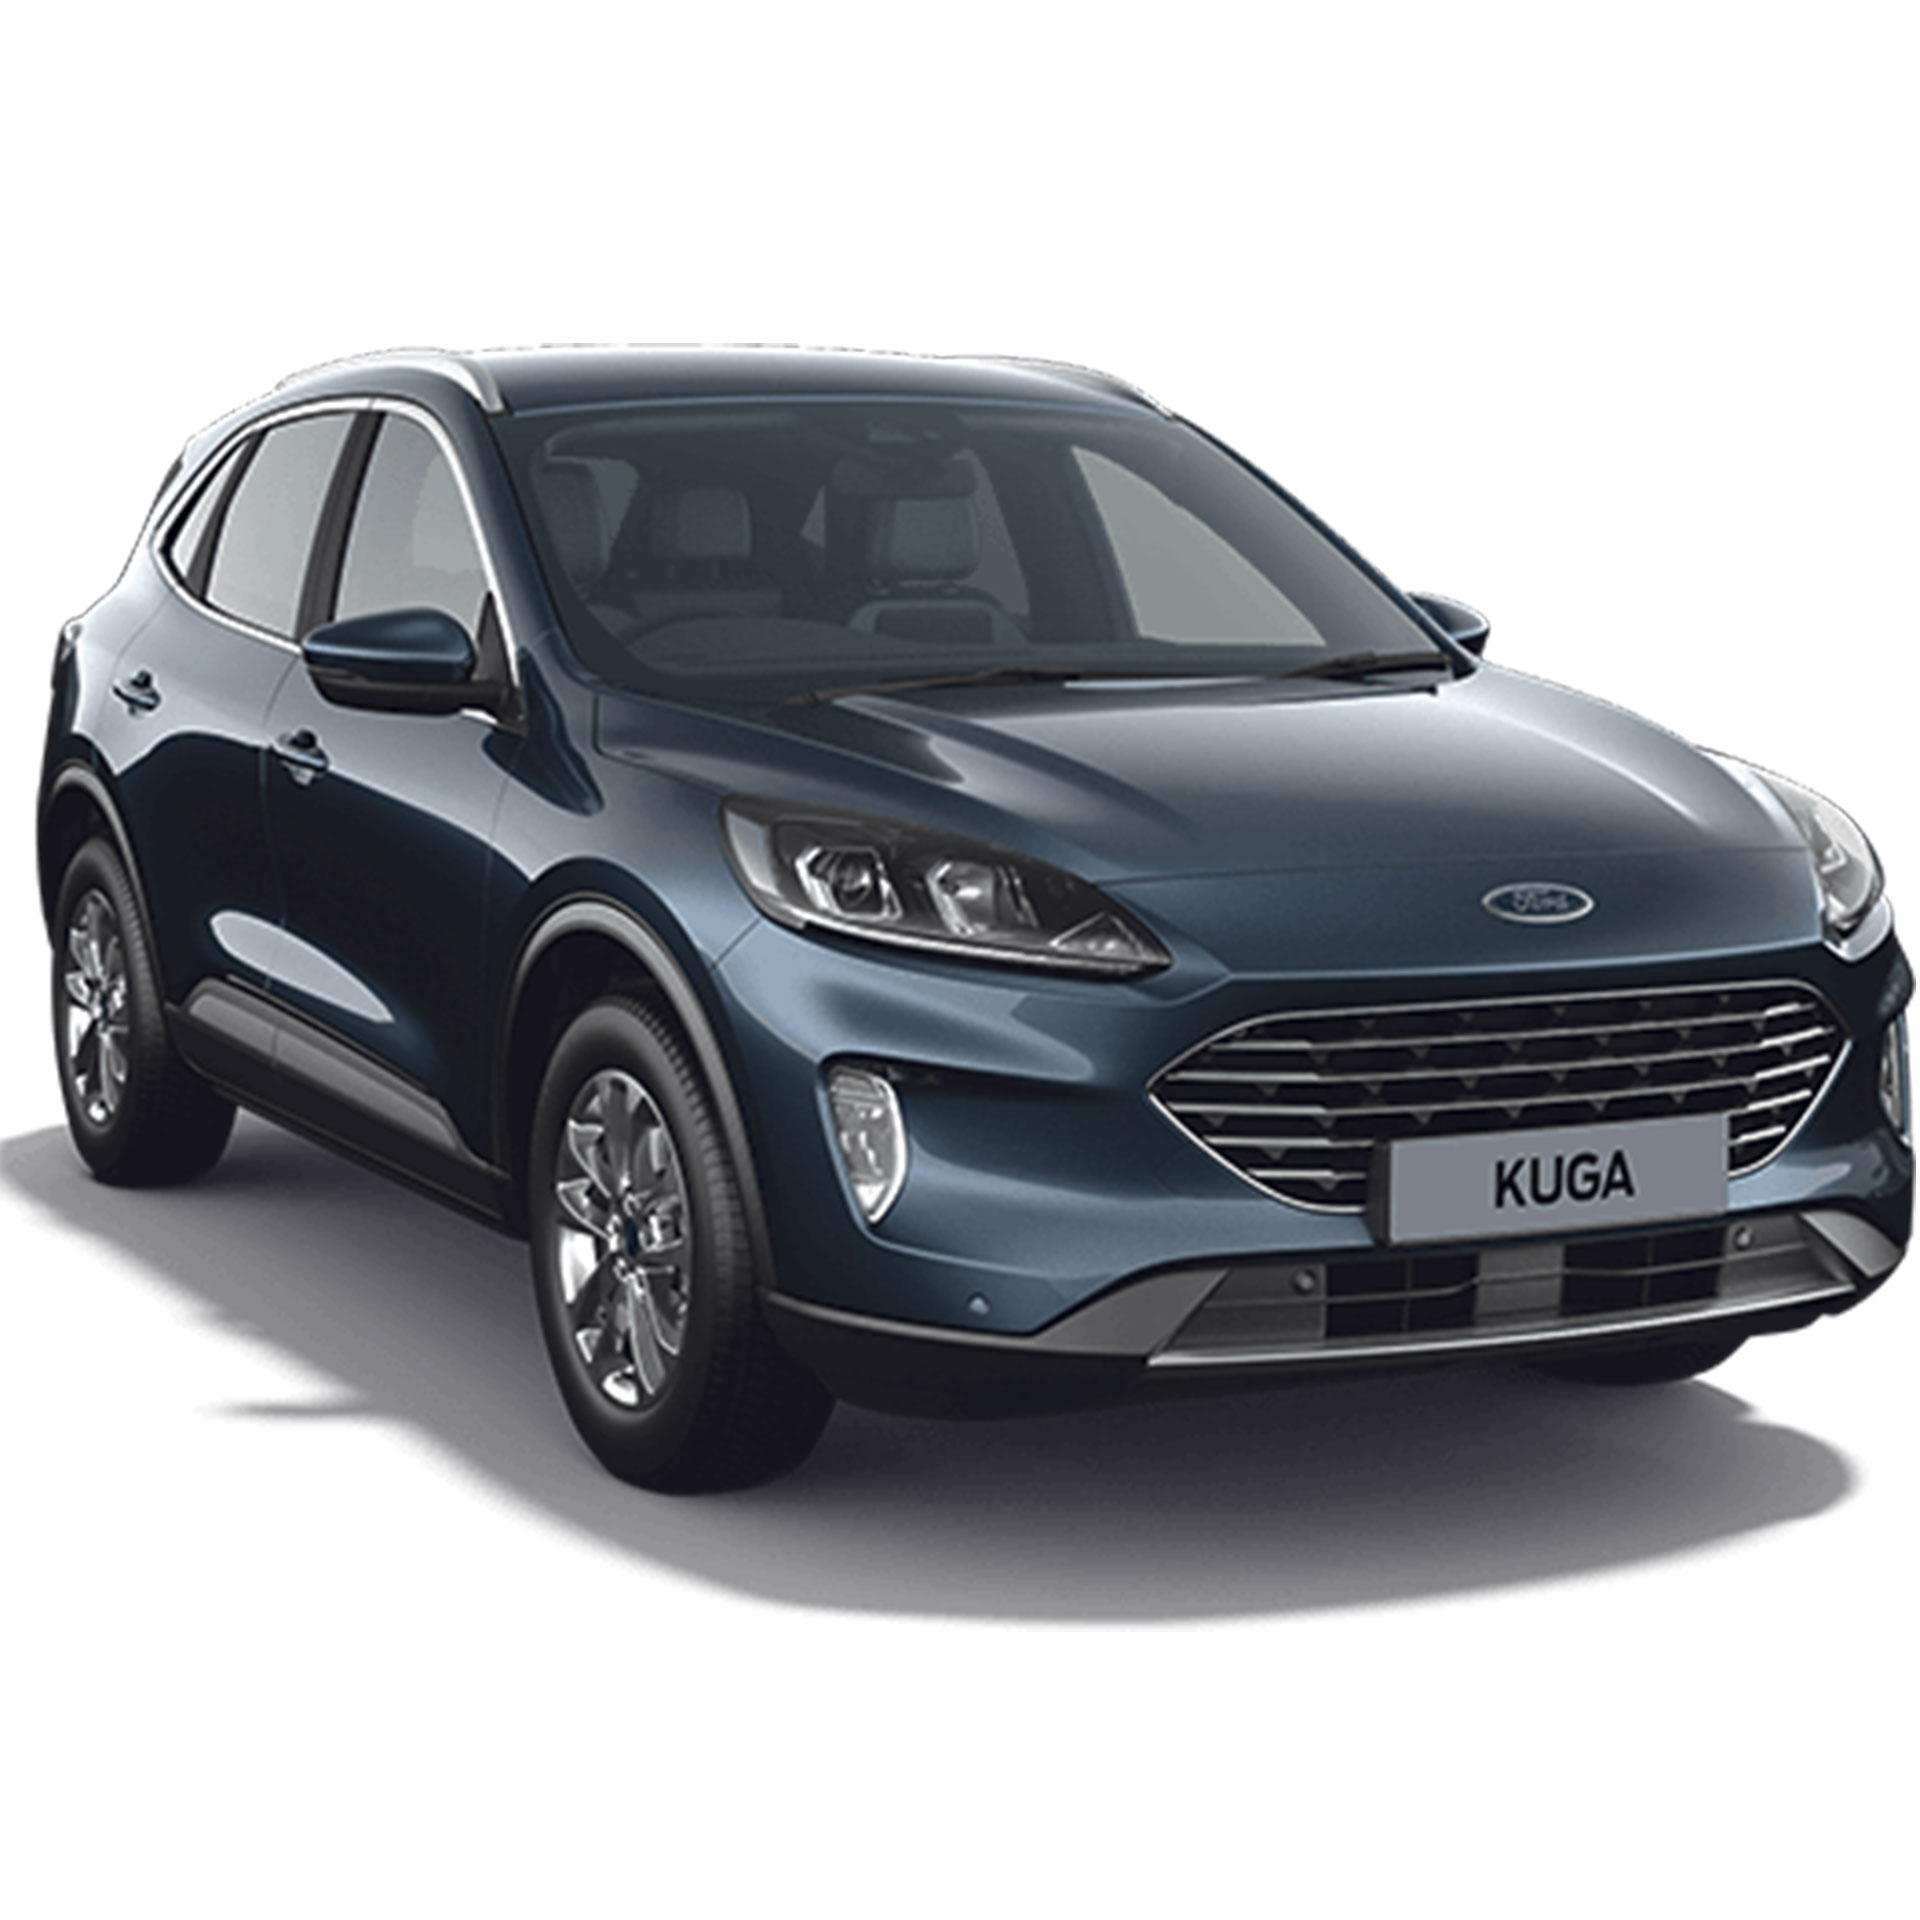 Ford Kuga Boot Liner (2019 Onwards)